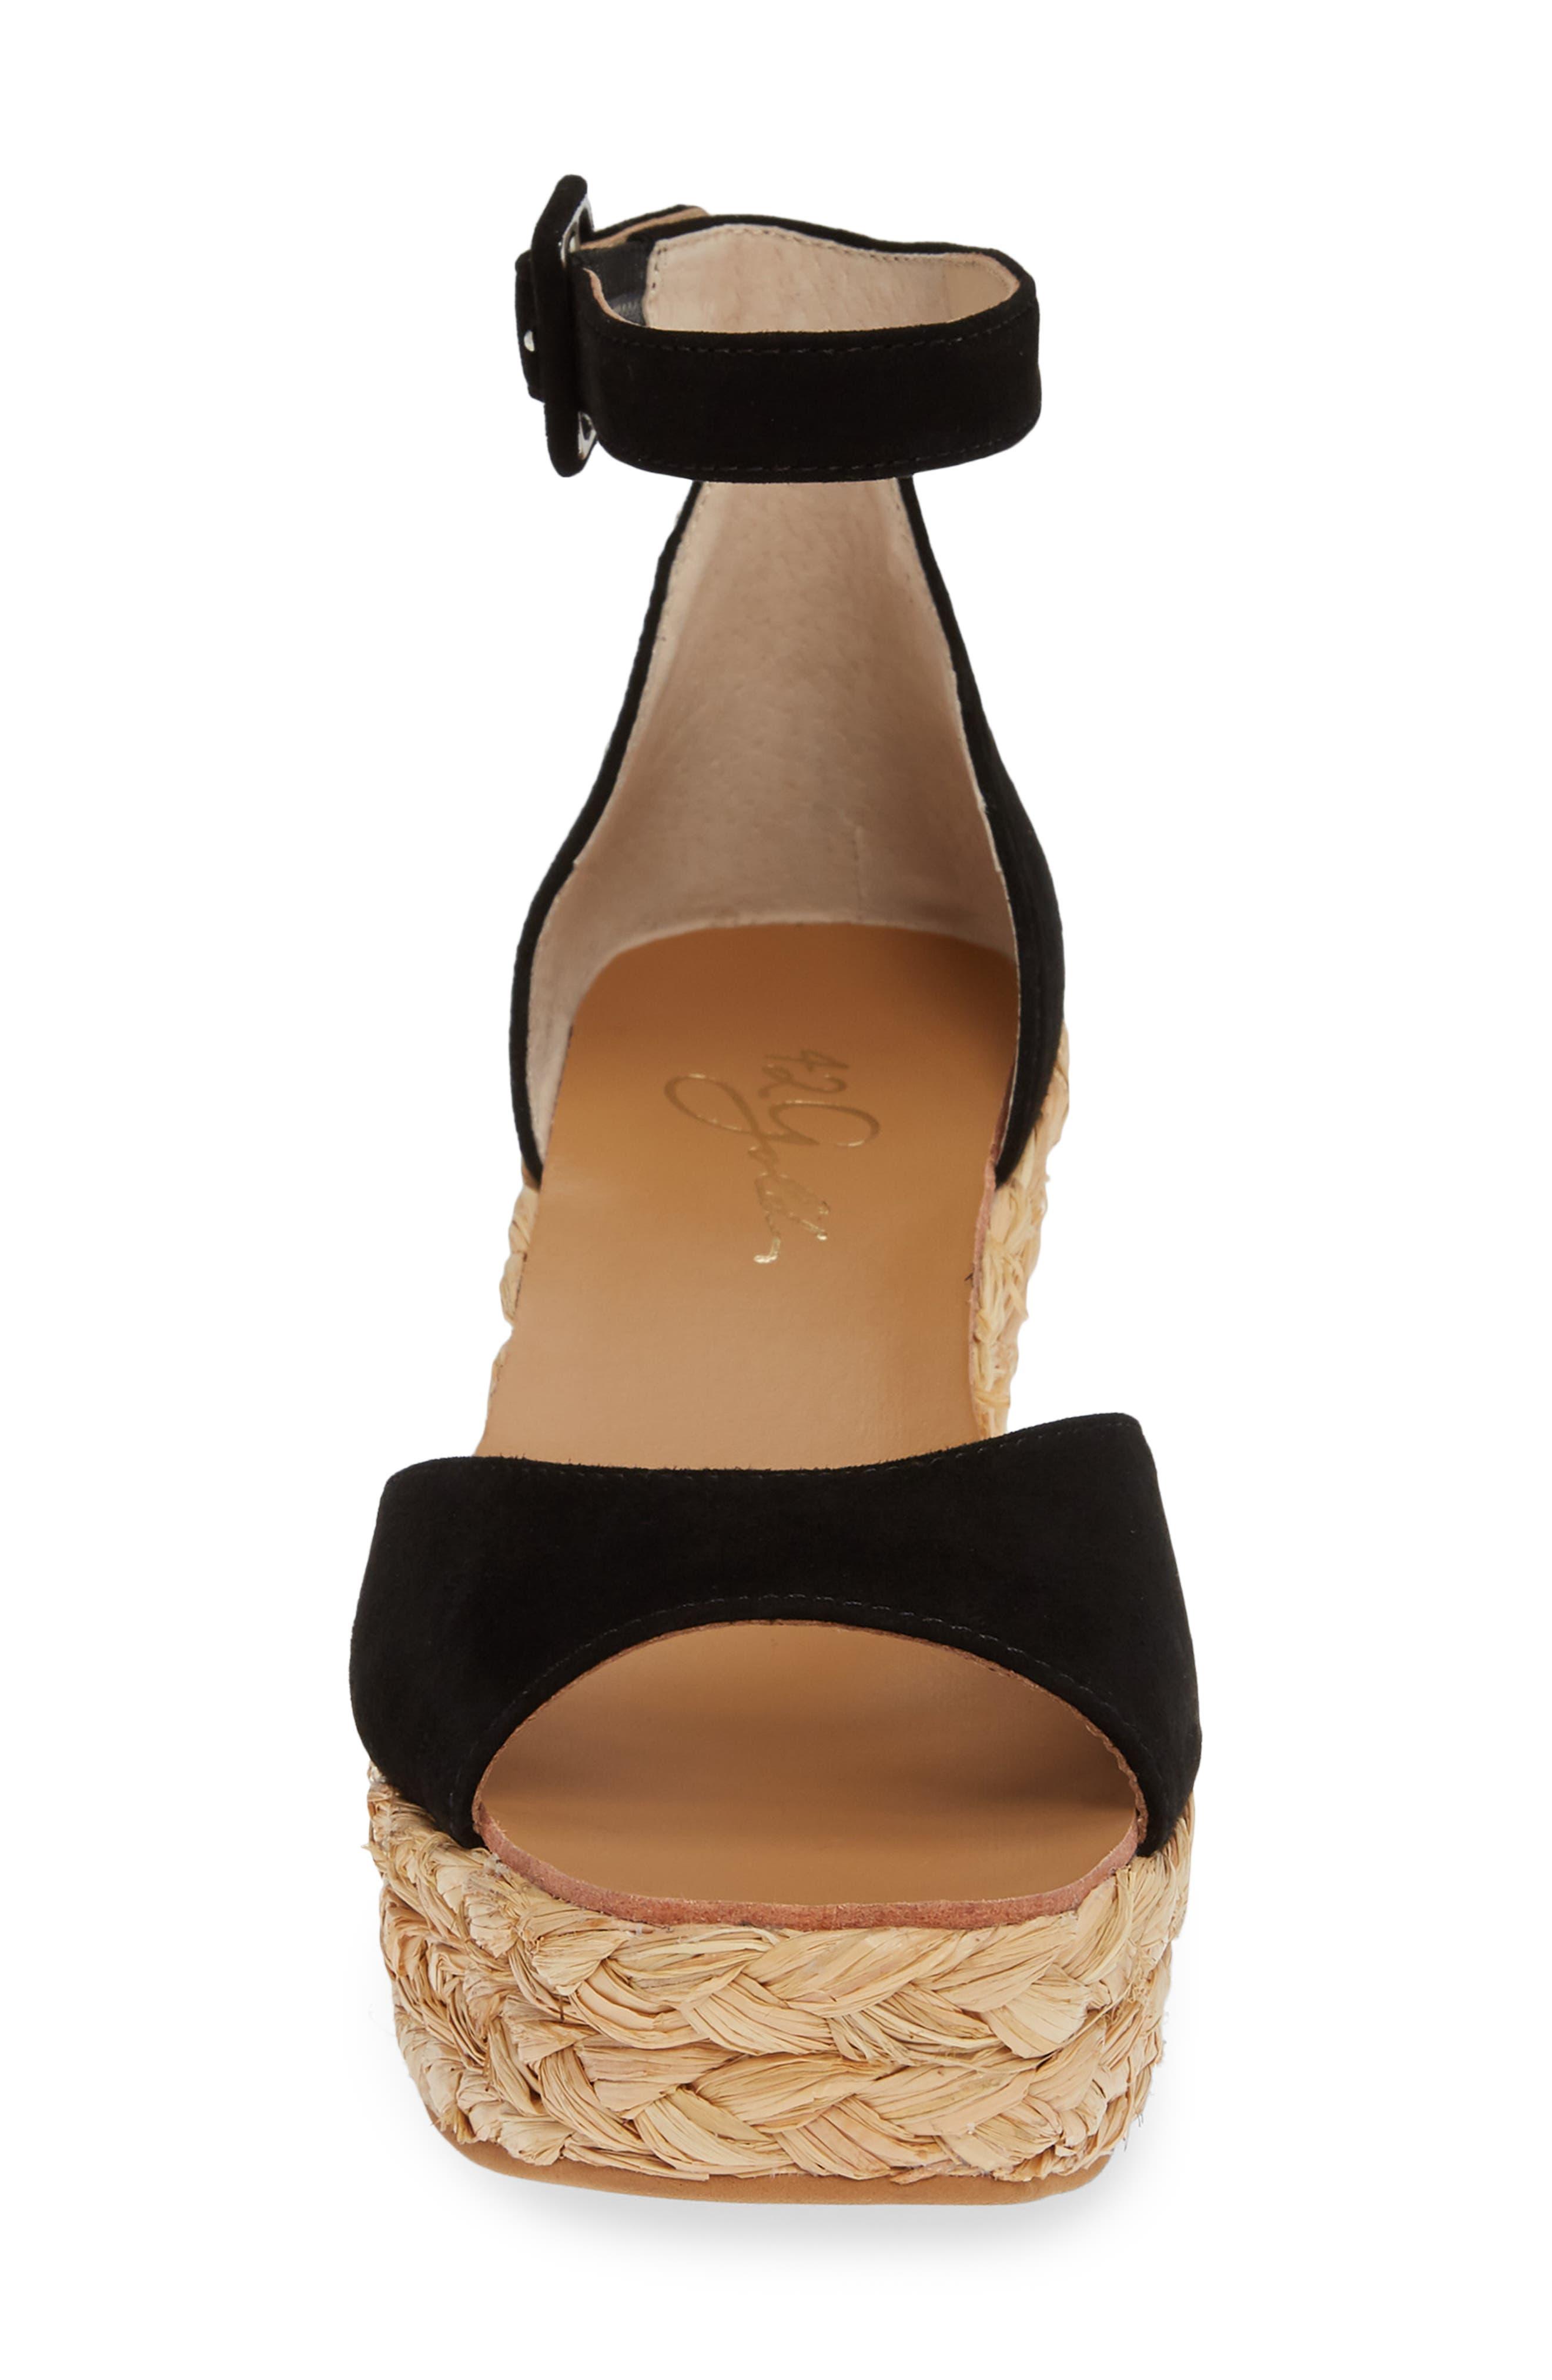 42 GOLD, Mindie Platform Wedge Sandal, Alternate thumbnail 4, color, BLACK SUEDE